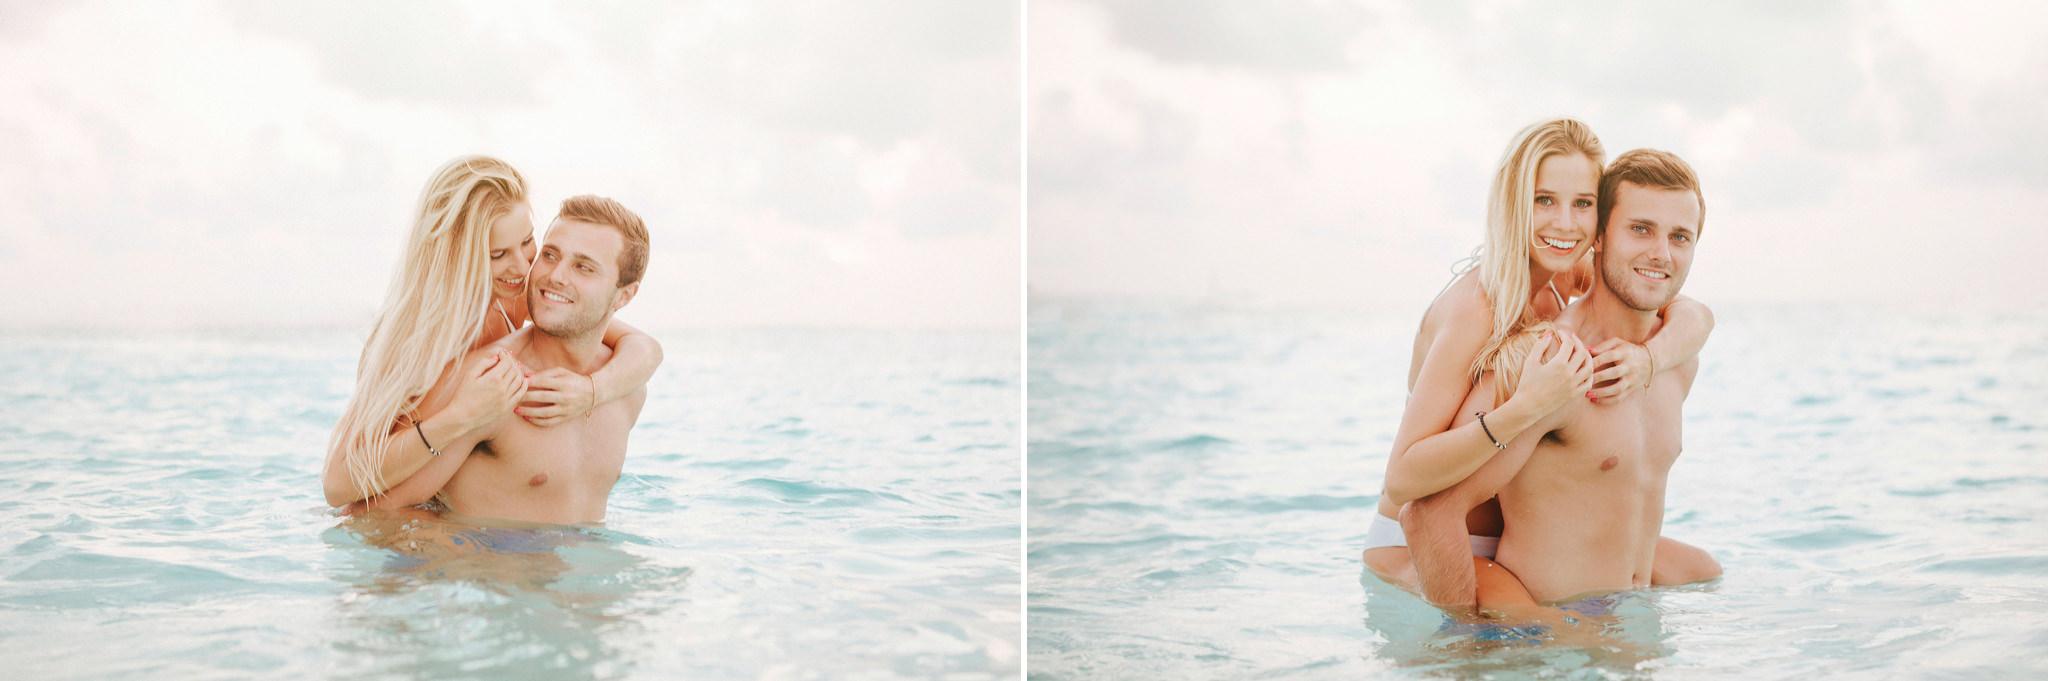 044-maldives-destination-wedding-photographer.jpg